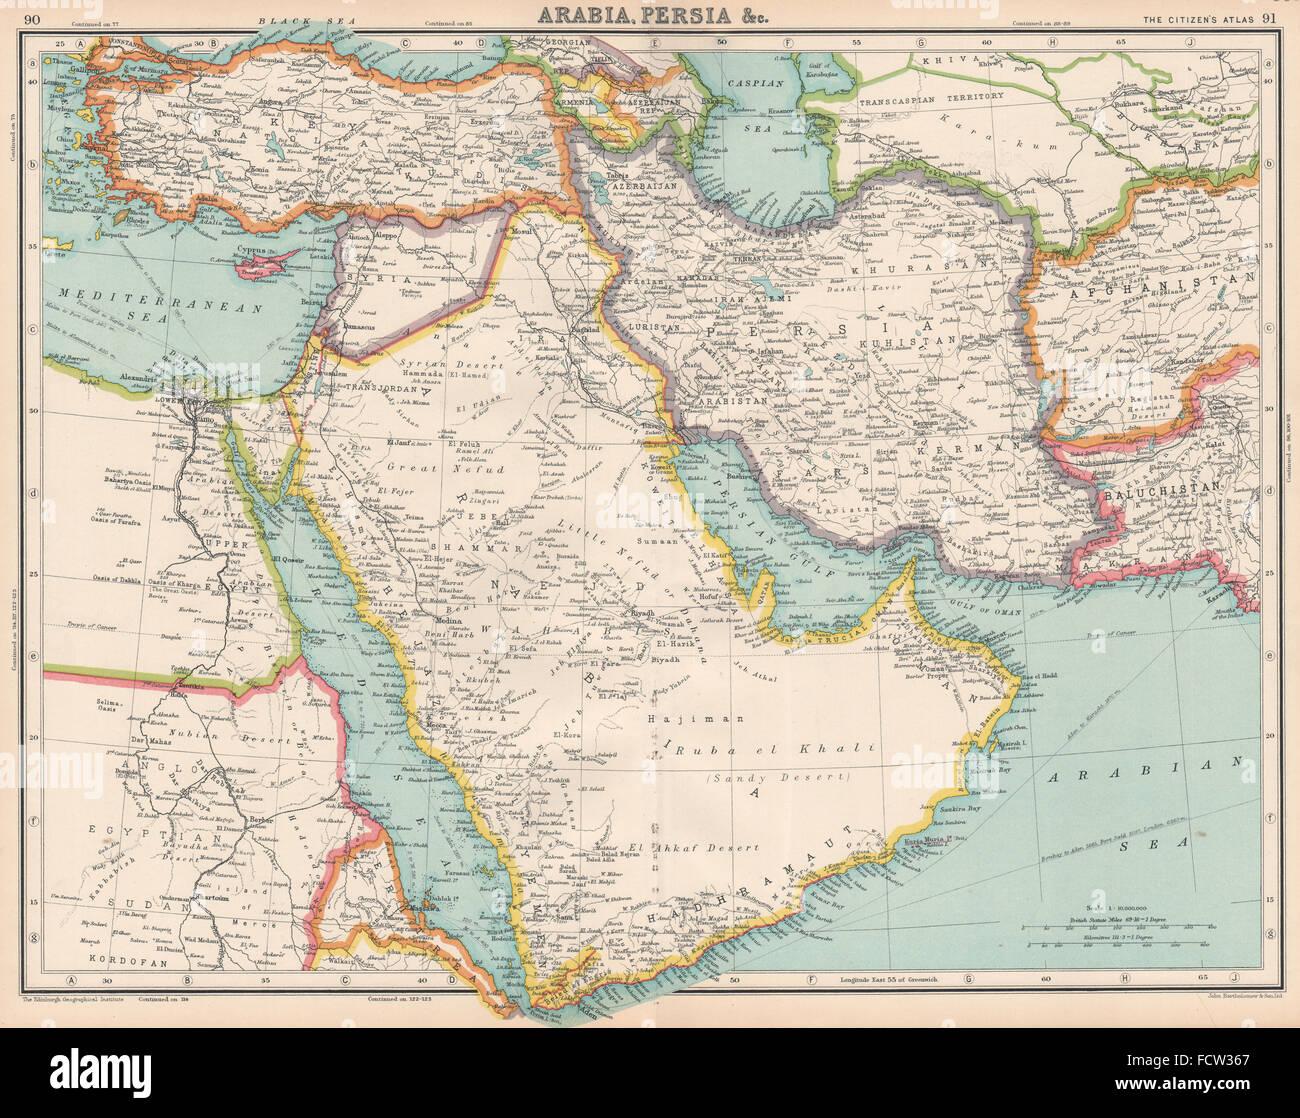 Naher Osten Karte Ohne Beschriftung.Mittlerer Osten Karte Stockfotos Mittlerer Osten Karte Bilder Alamy